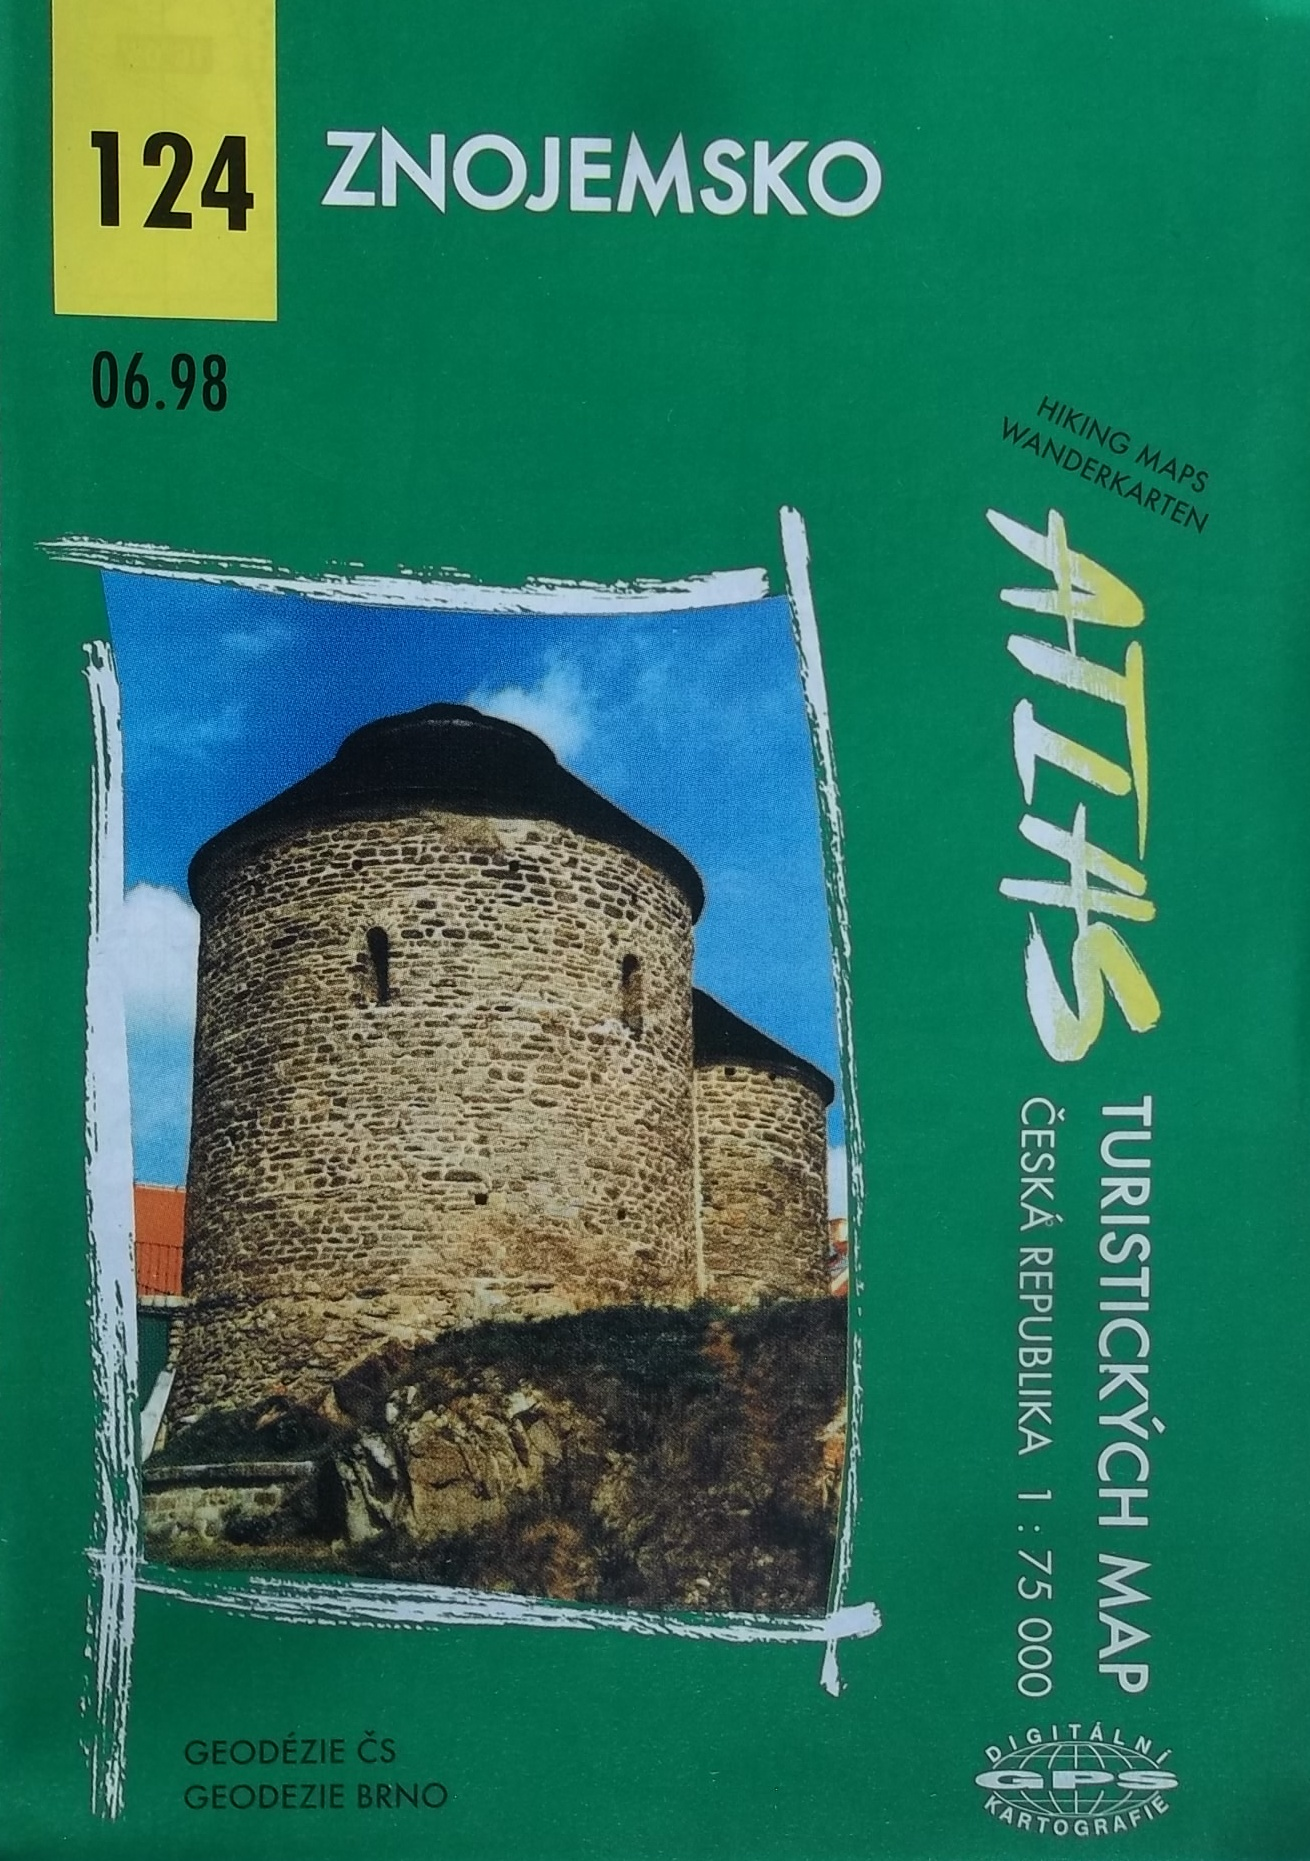 Znojemsko - Atlas turistických map 124